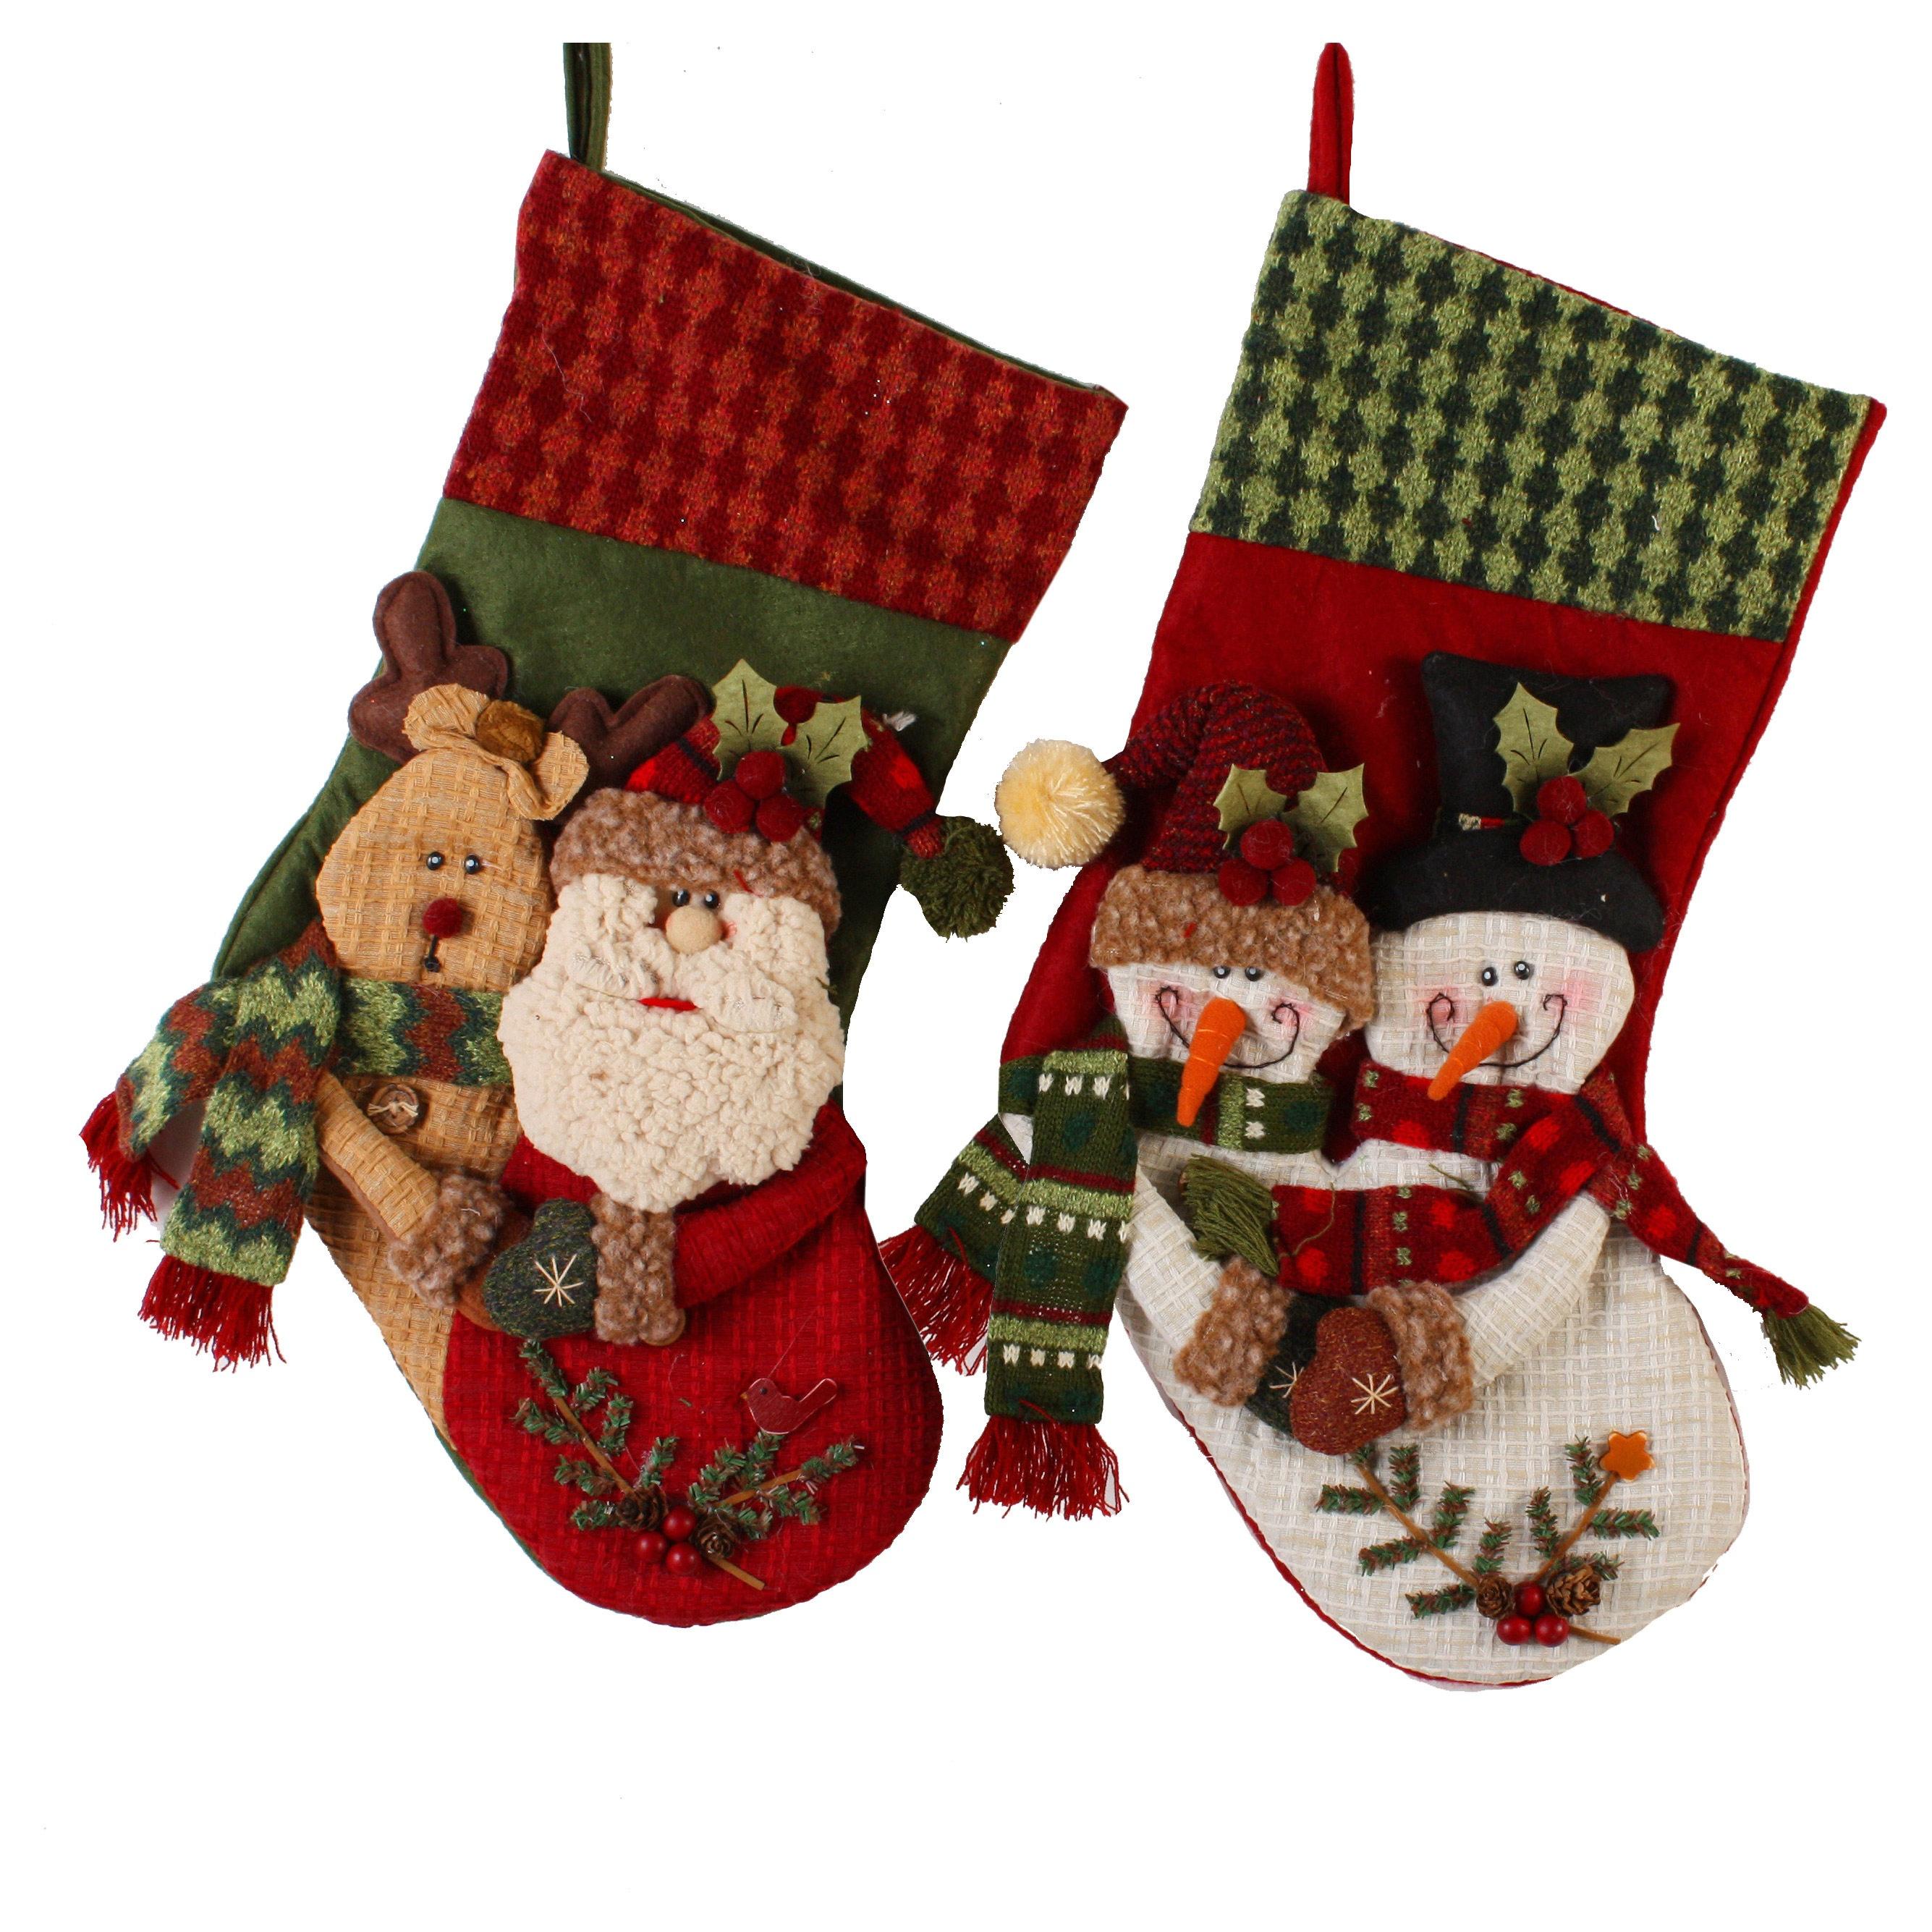 Snowman Christmas Stockings